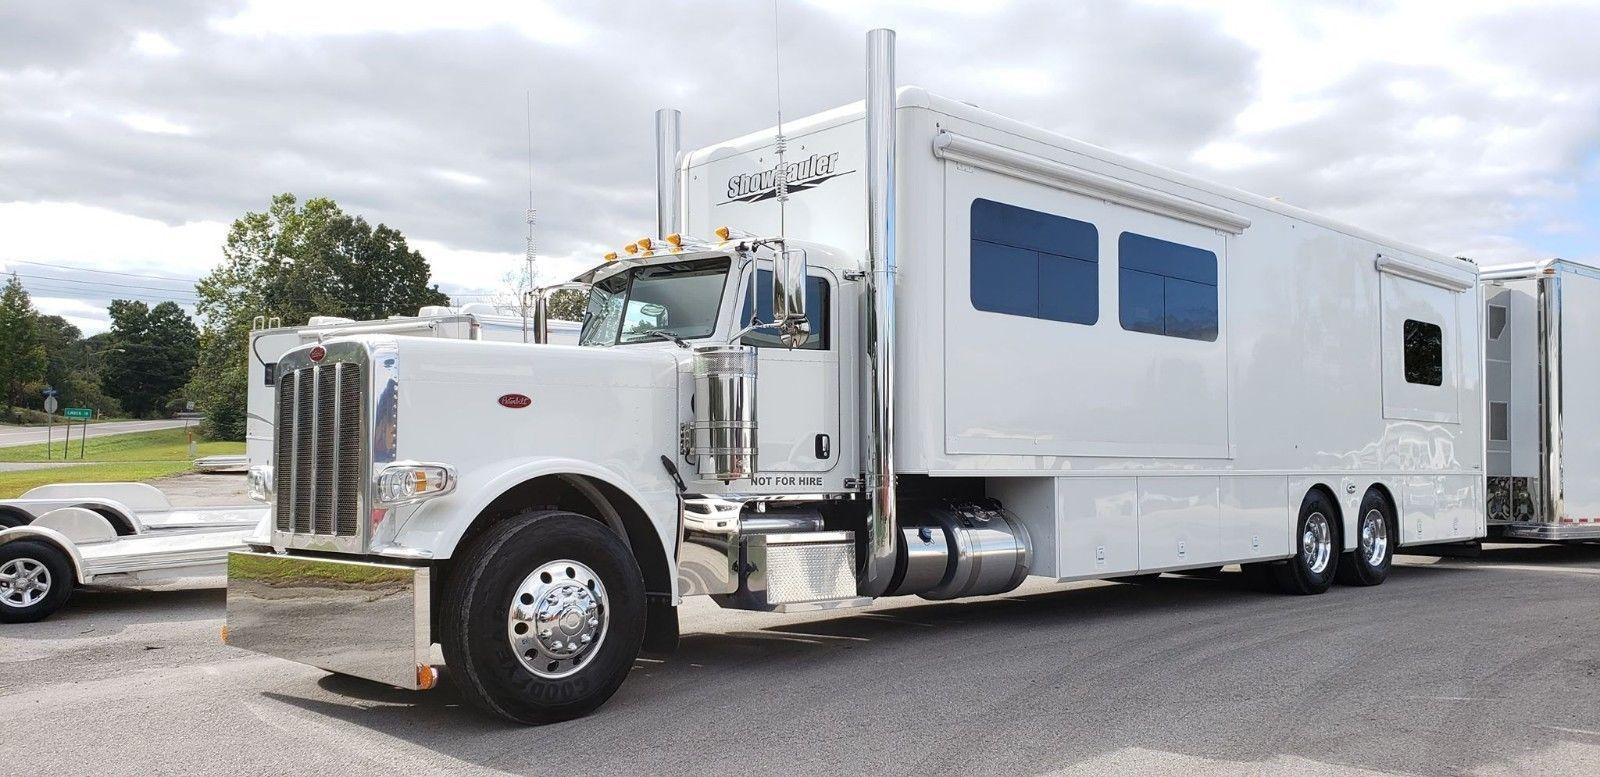 2016 Showhauler 45 3 Slides Motorhome Toterhome Peterbilt Chassis 14k Miles Ebay Peterbilt Peterbilt Trucks Big Trucks